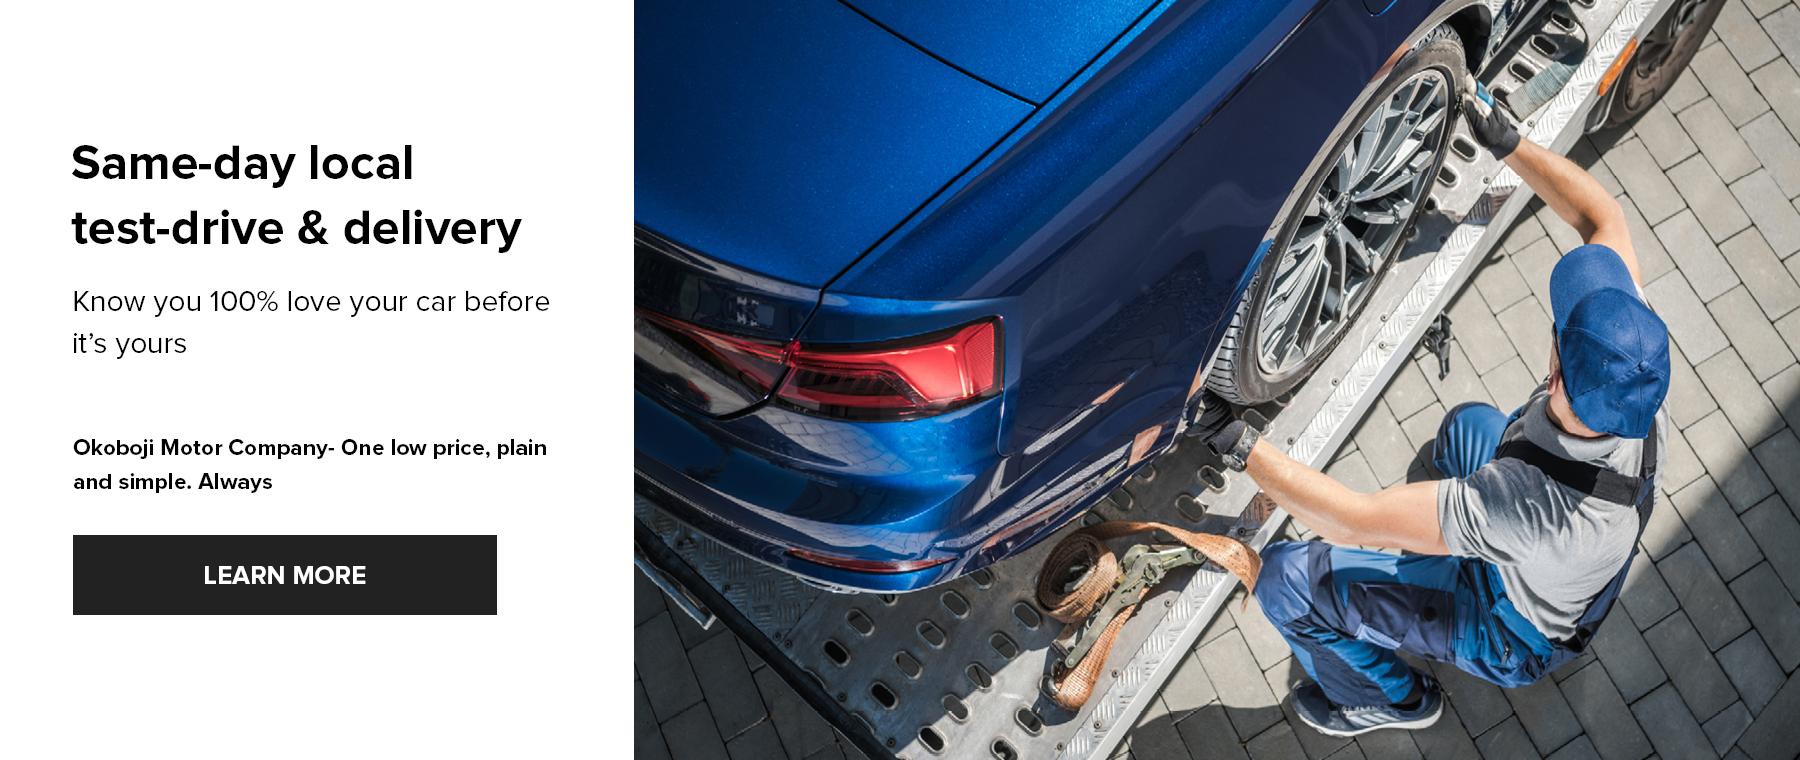 Test Drive_Home Delivery Slider 1800×760